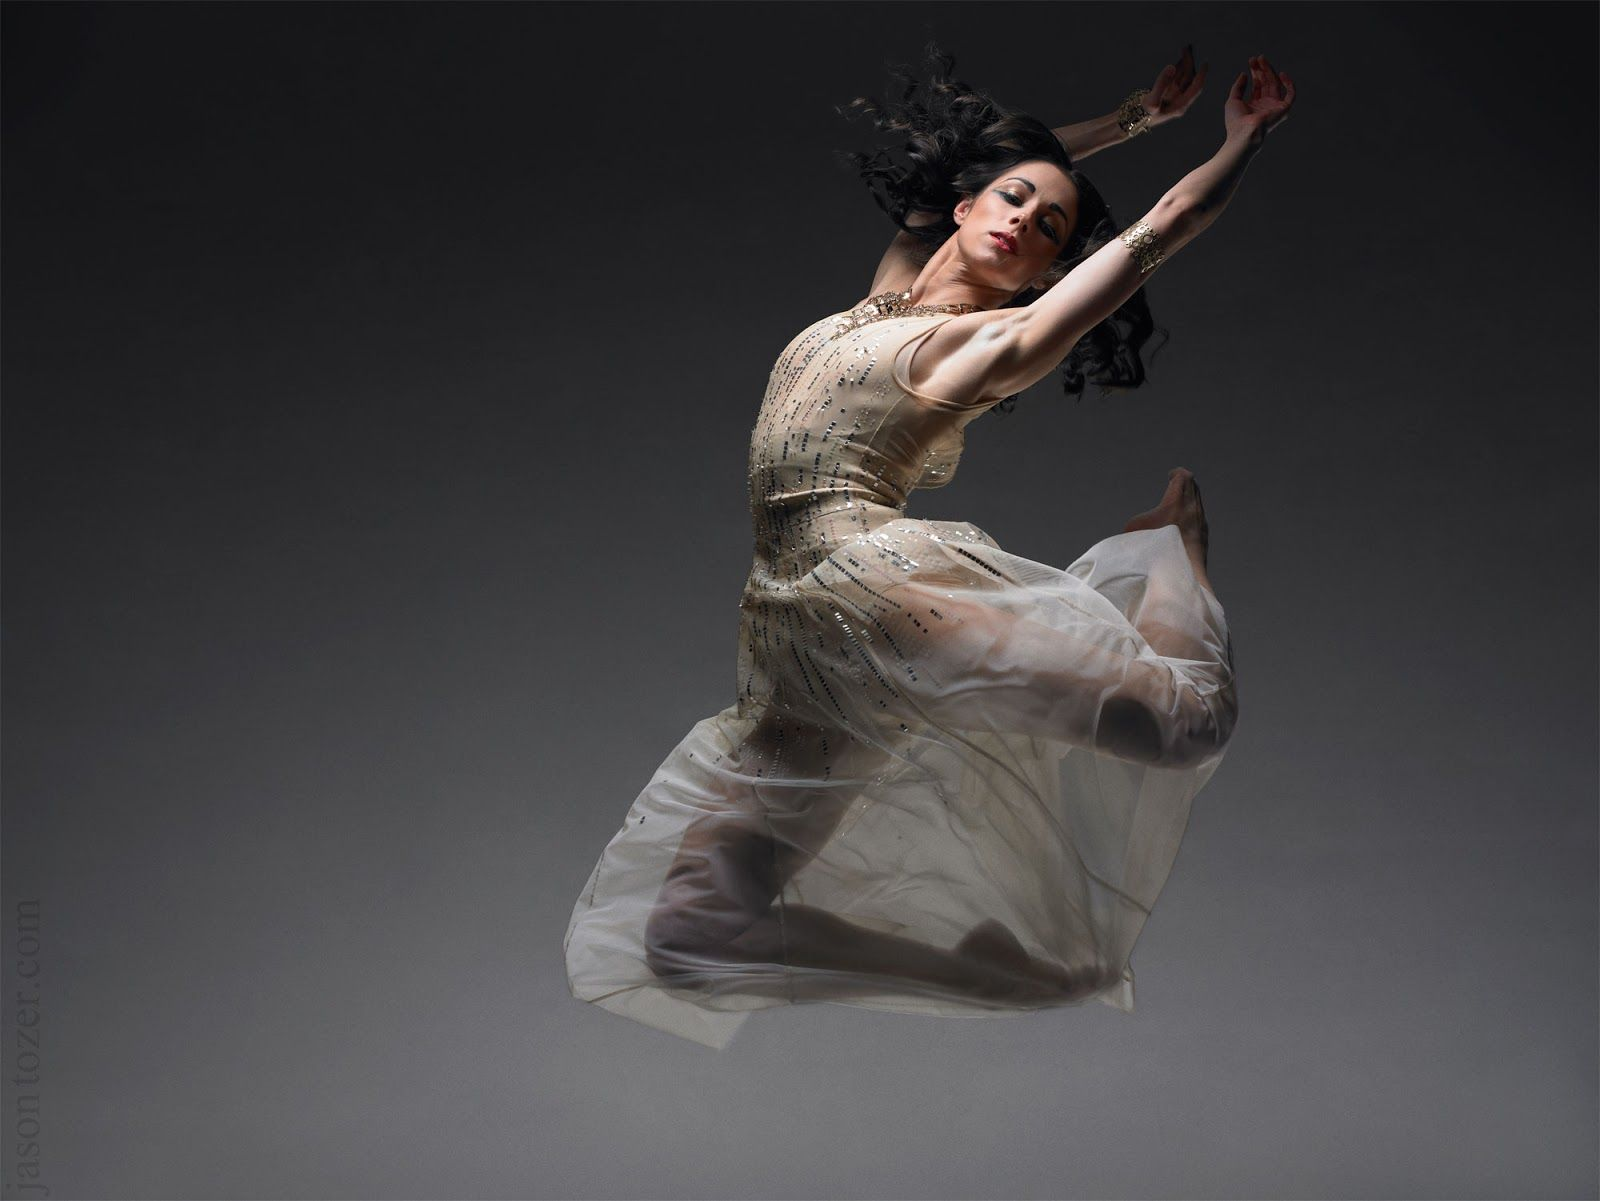 DancinPhotos: Jason Tozer